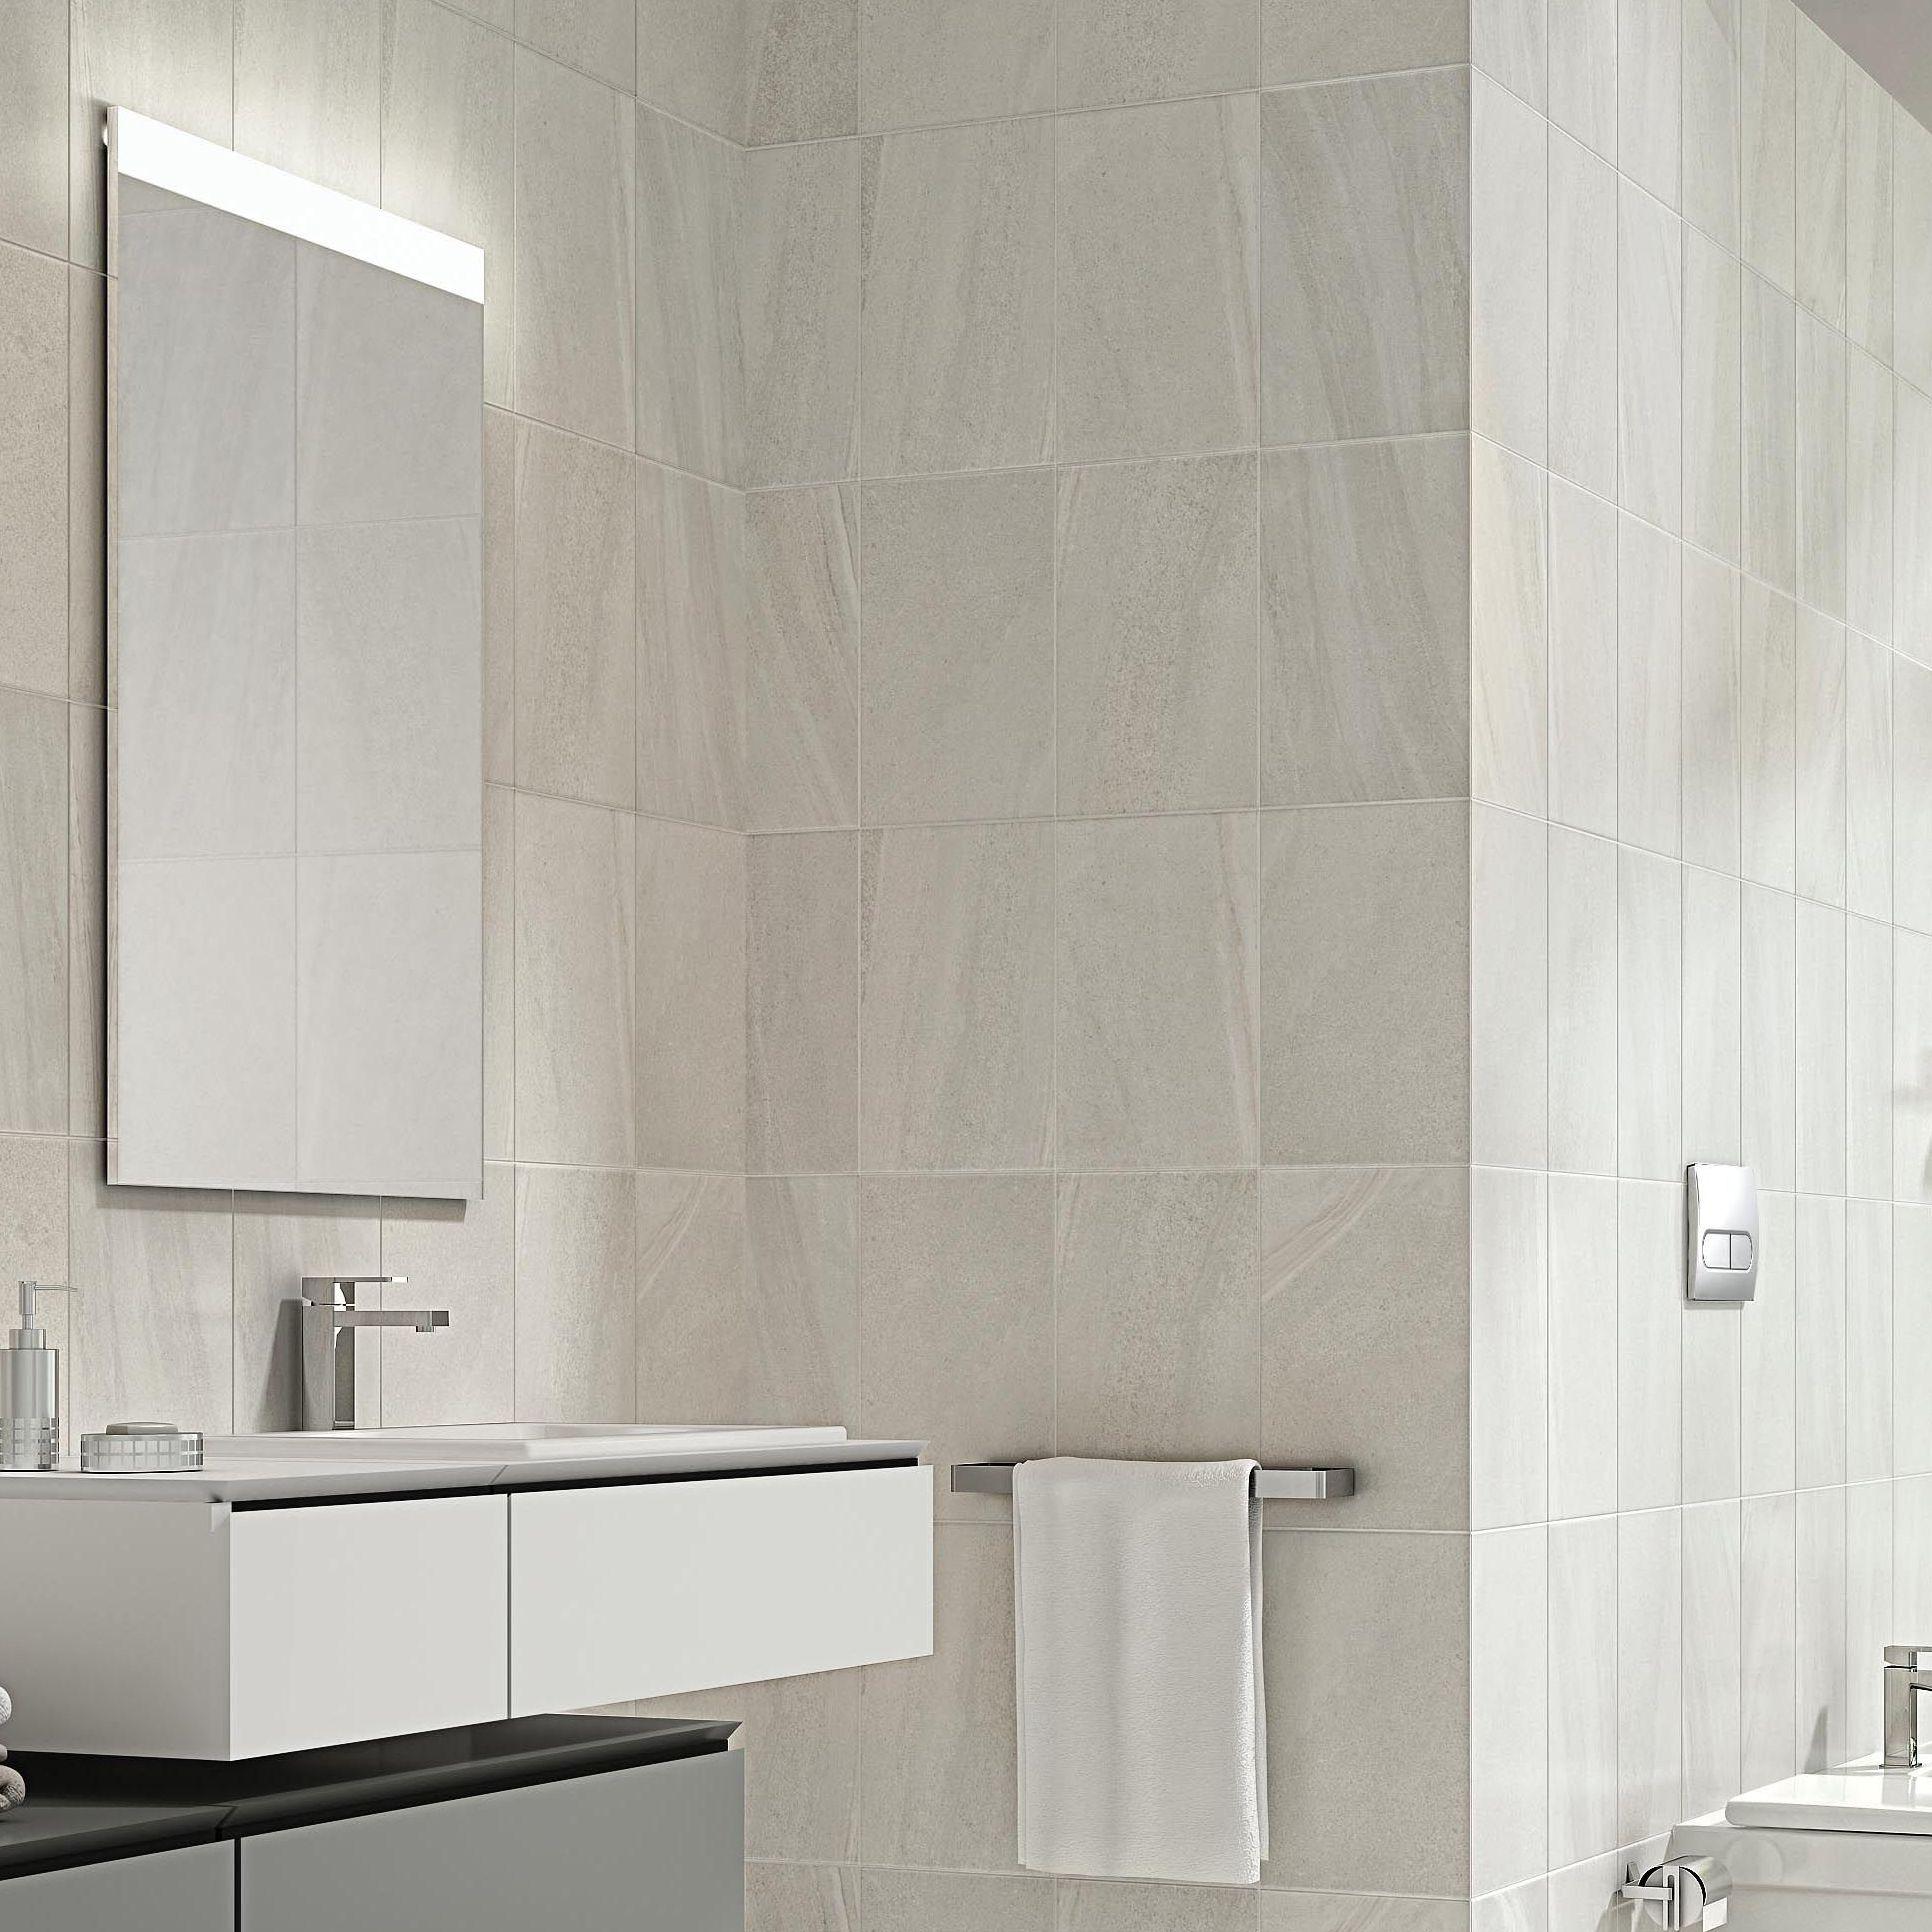 Levanto White Ceramic Wall Tile Pack Of 10 L 250mm W: Fiji White Stone Effect Ceramic Wall Tile, Pack Of 10, (L